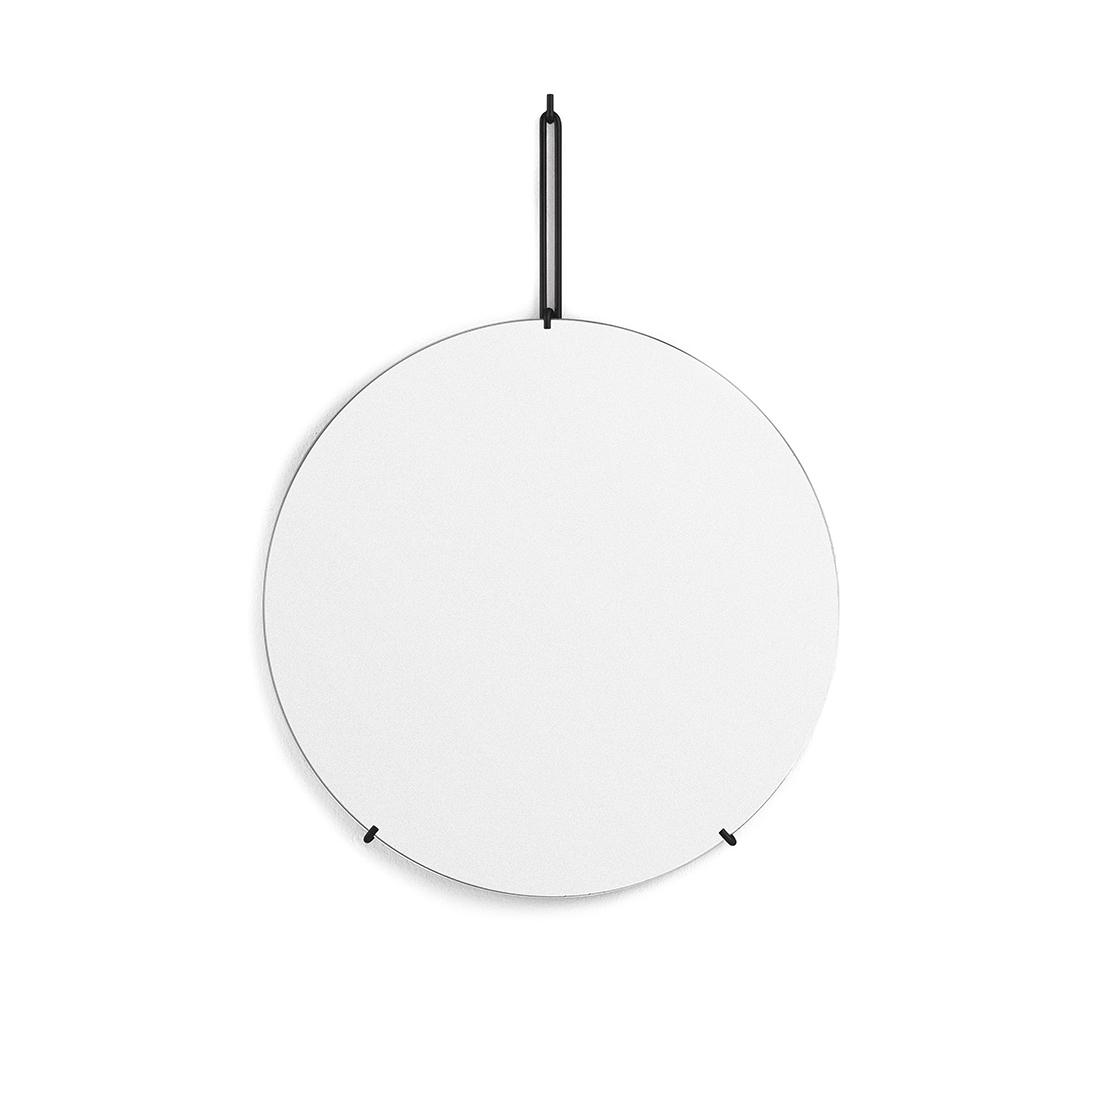 Spegel Ø50cm WALL MIRROR black, MOEBE